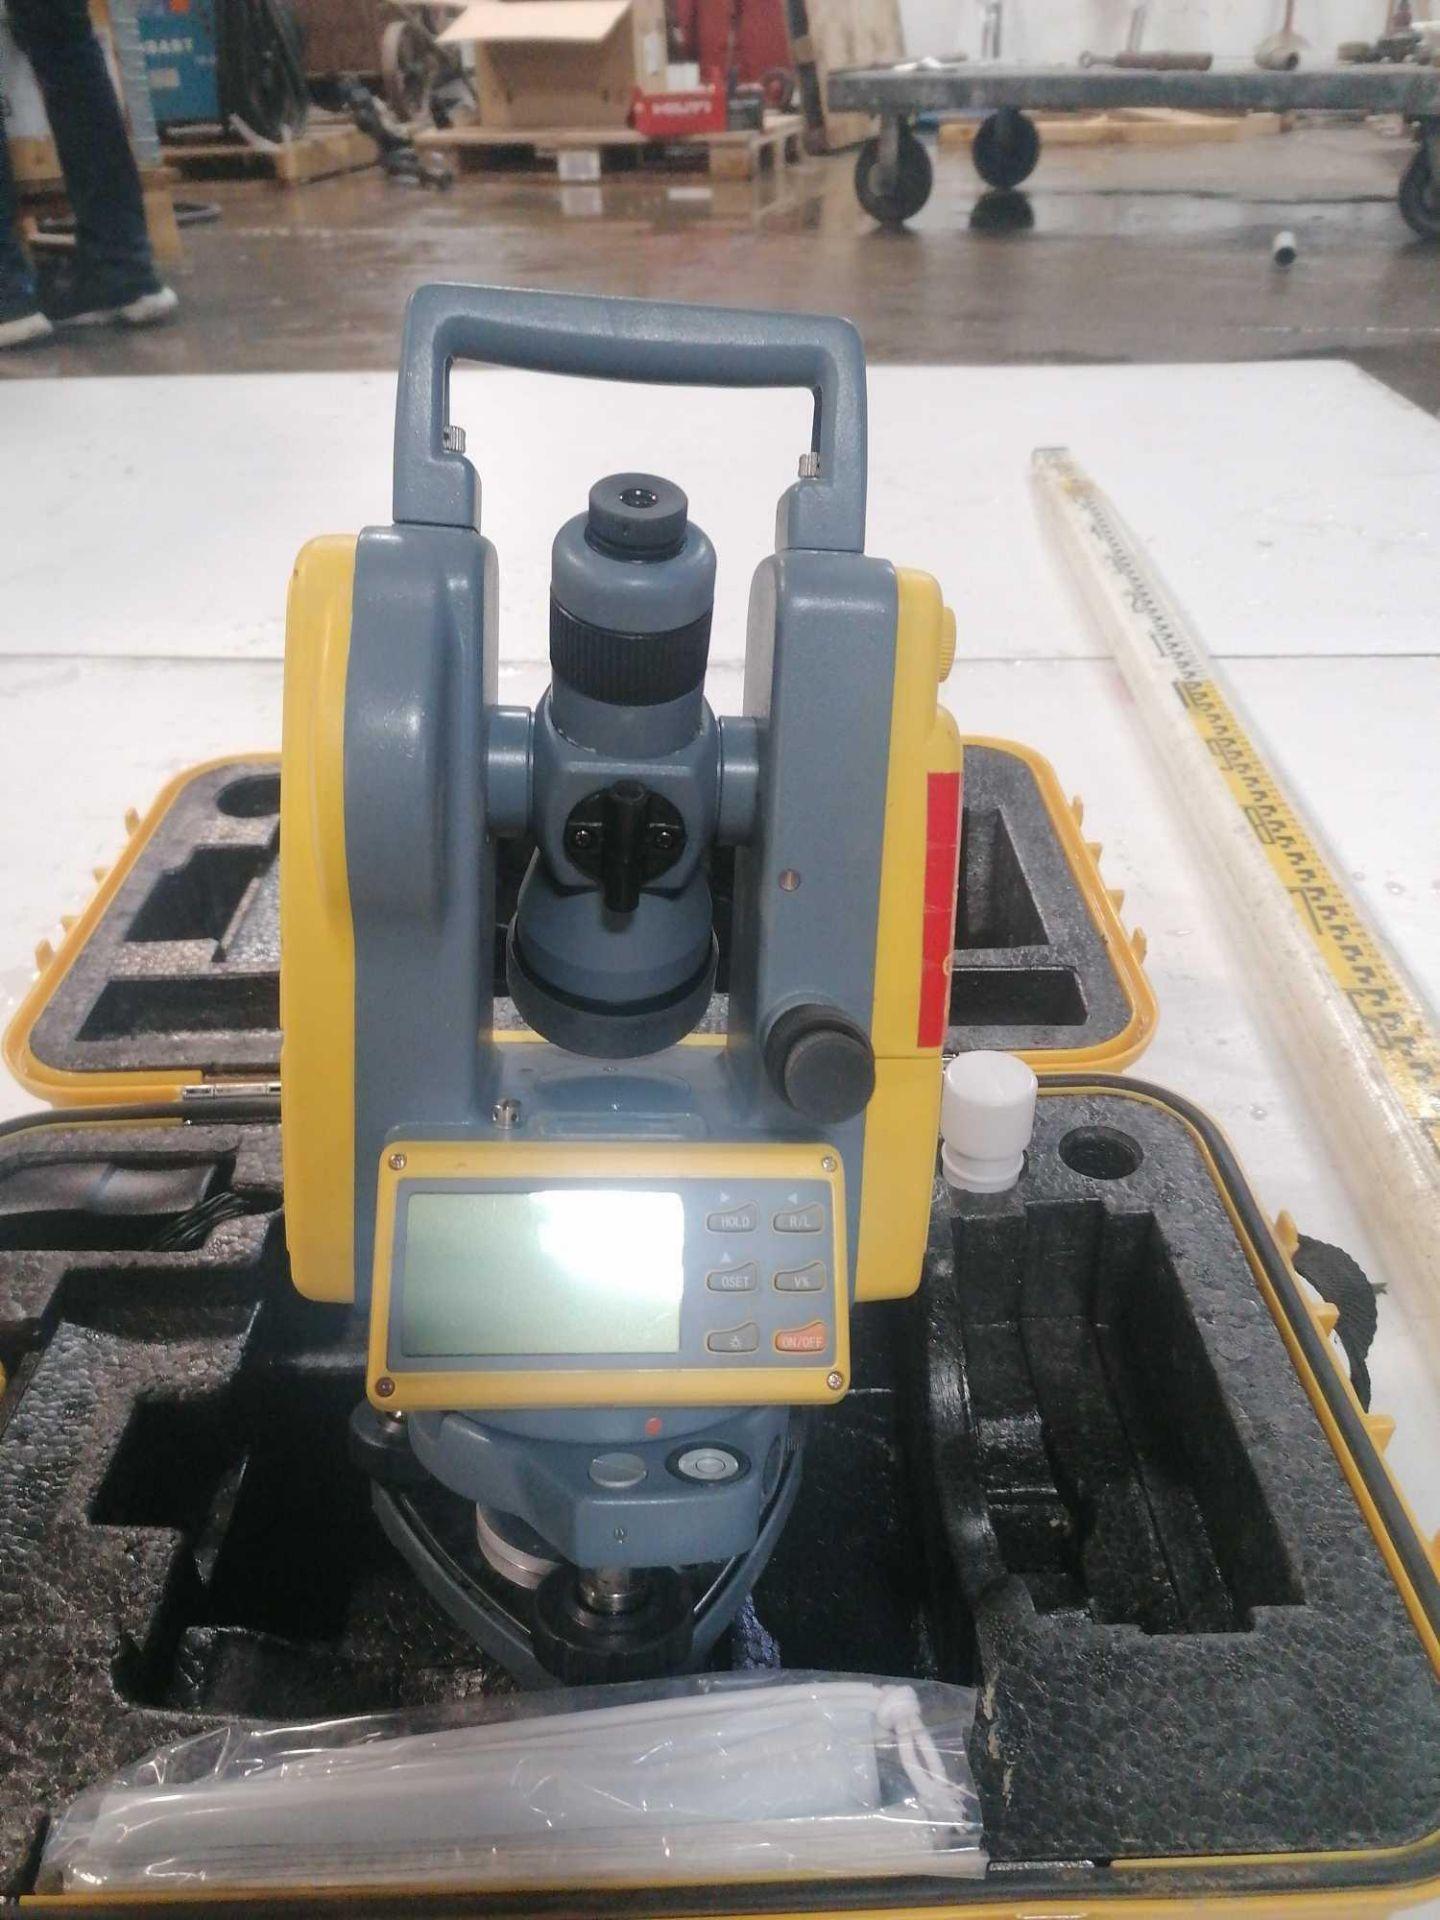 Lot 148 - Spectra Precision DET-2 Theodolite Laser